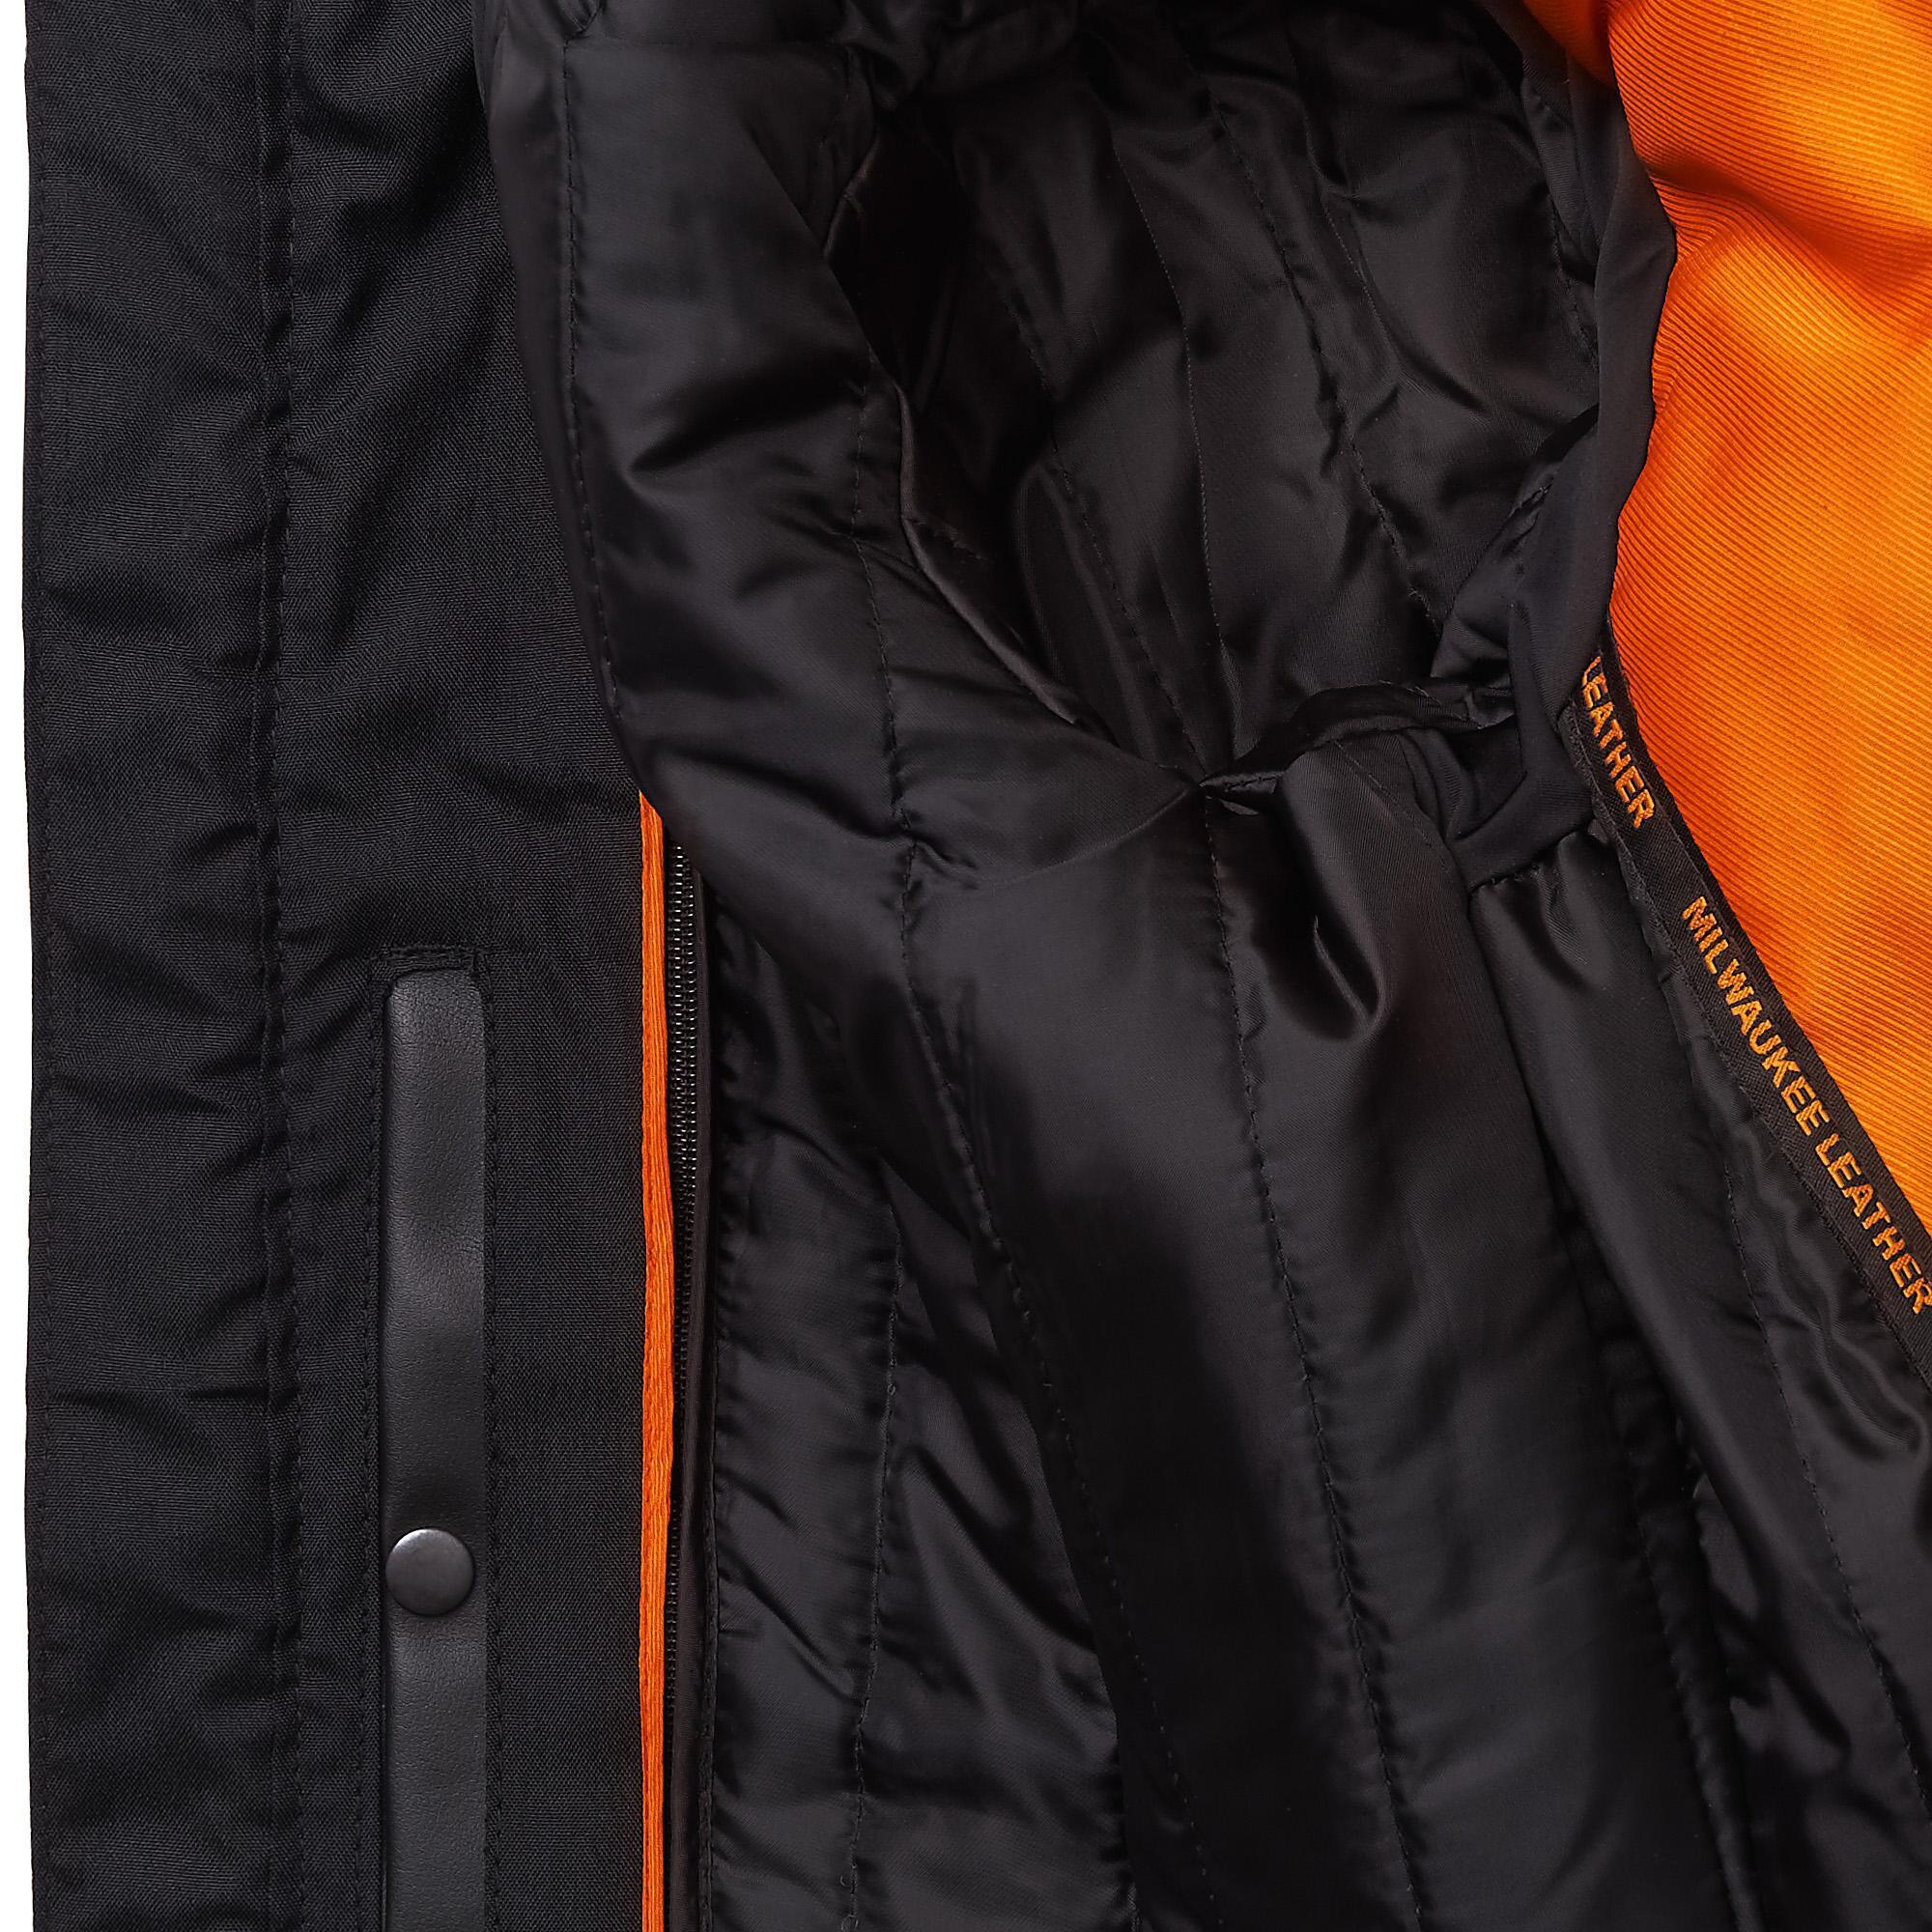 93ca46ec0112c8 ... Big   Tall Milwaukee Leather Tab Collar Leather Jacket W  Zip. View  fullscreen